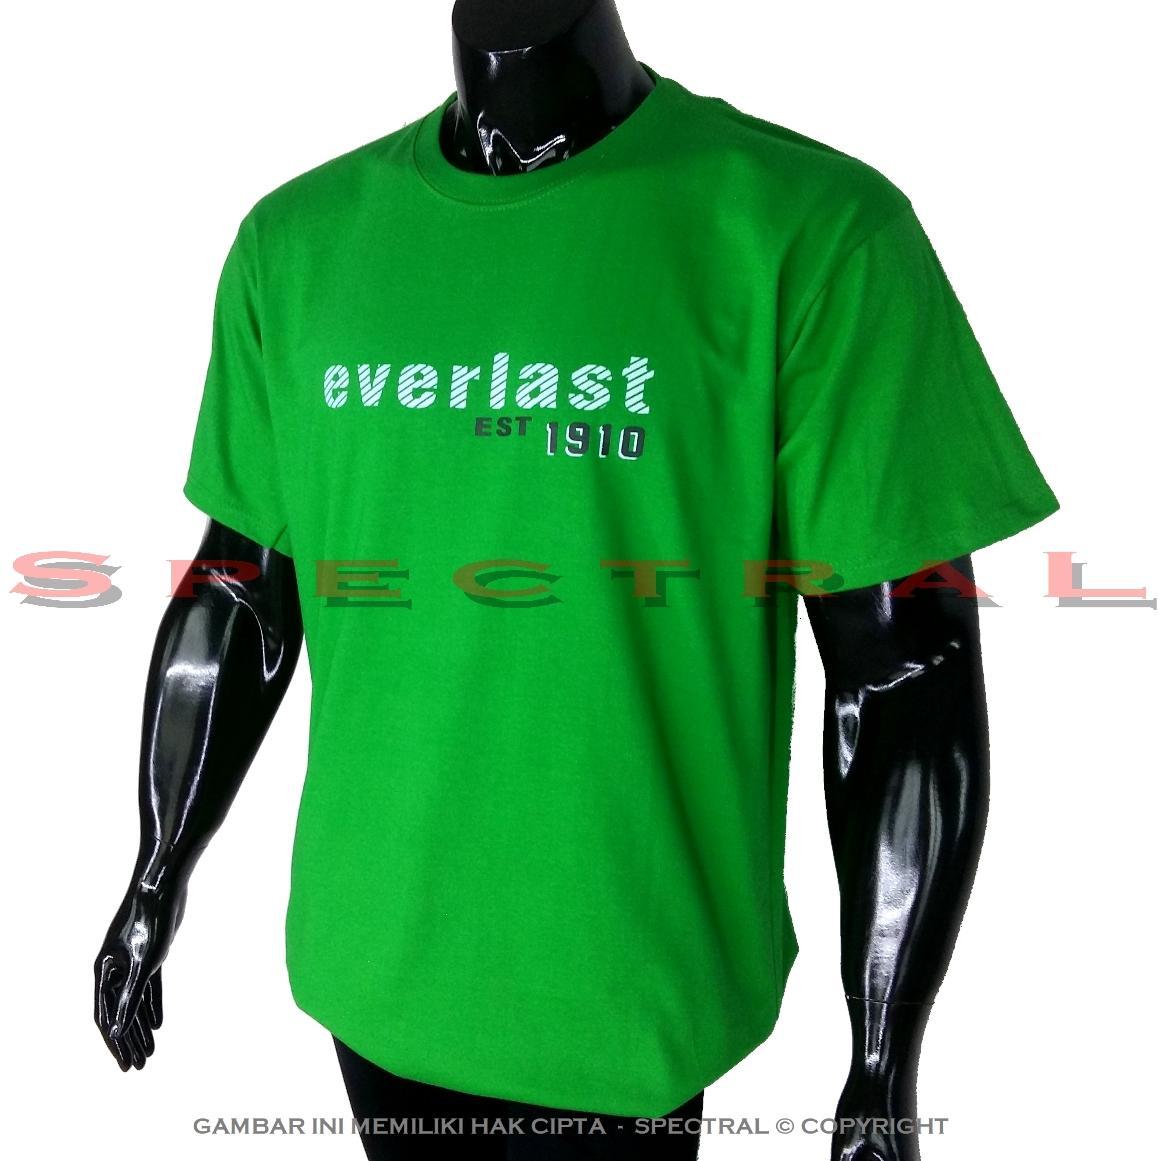 Spectral – BIG SIZE XXL INTERNATIONAL Soft Cotton Combed Kaos Distro Jumbo BIGSIZE T-Shirt